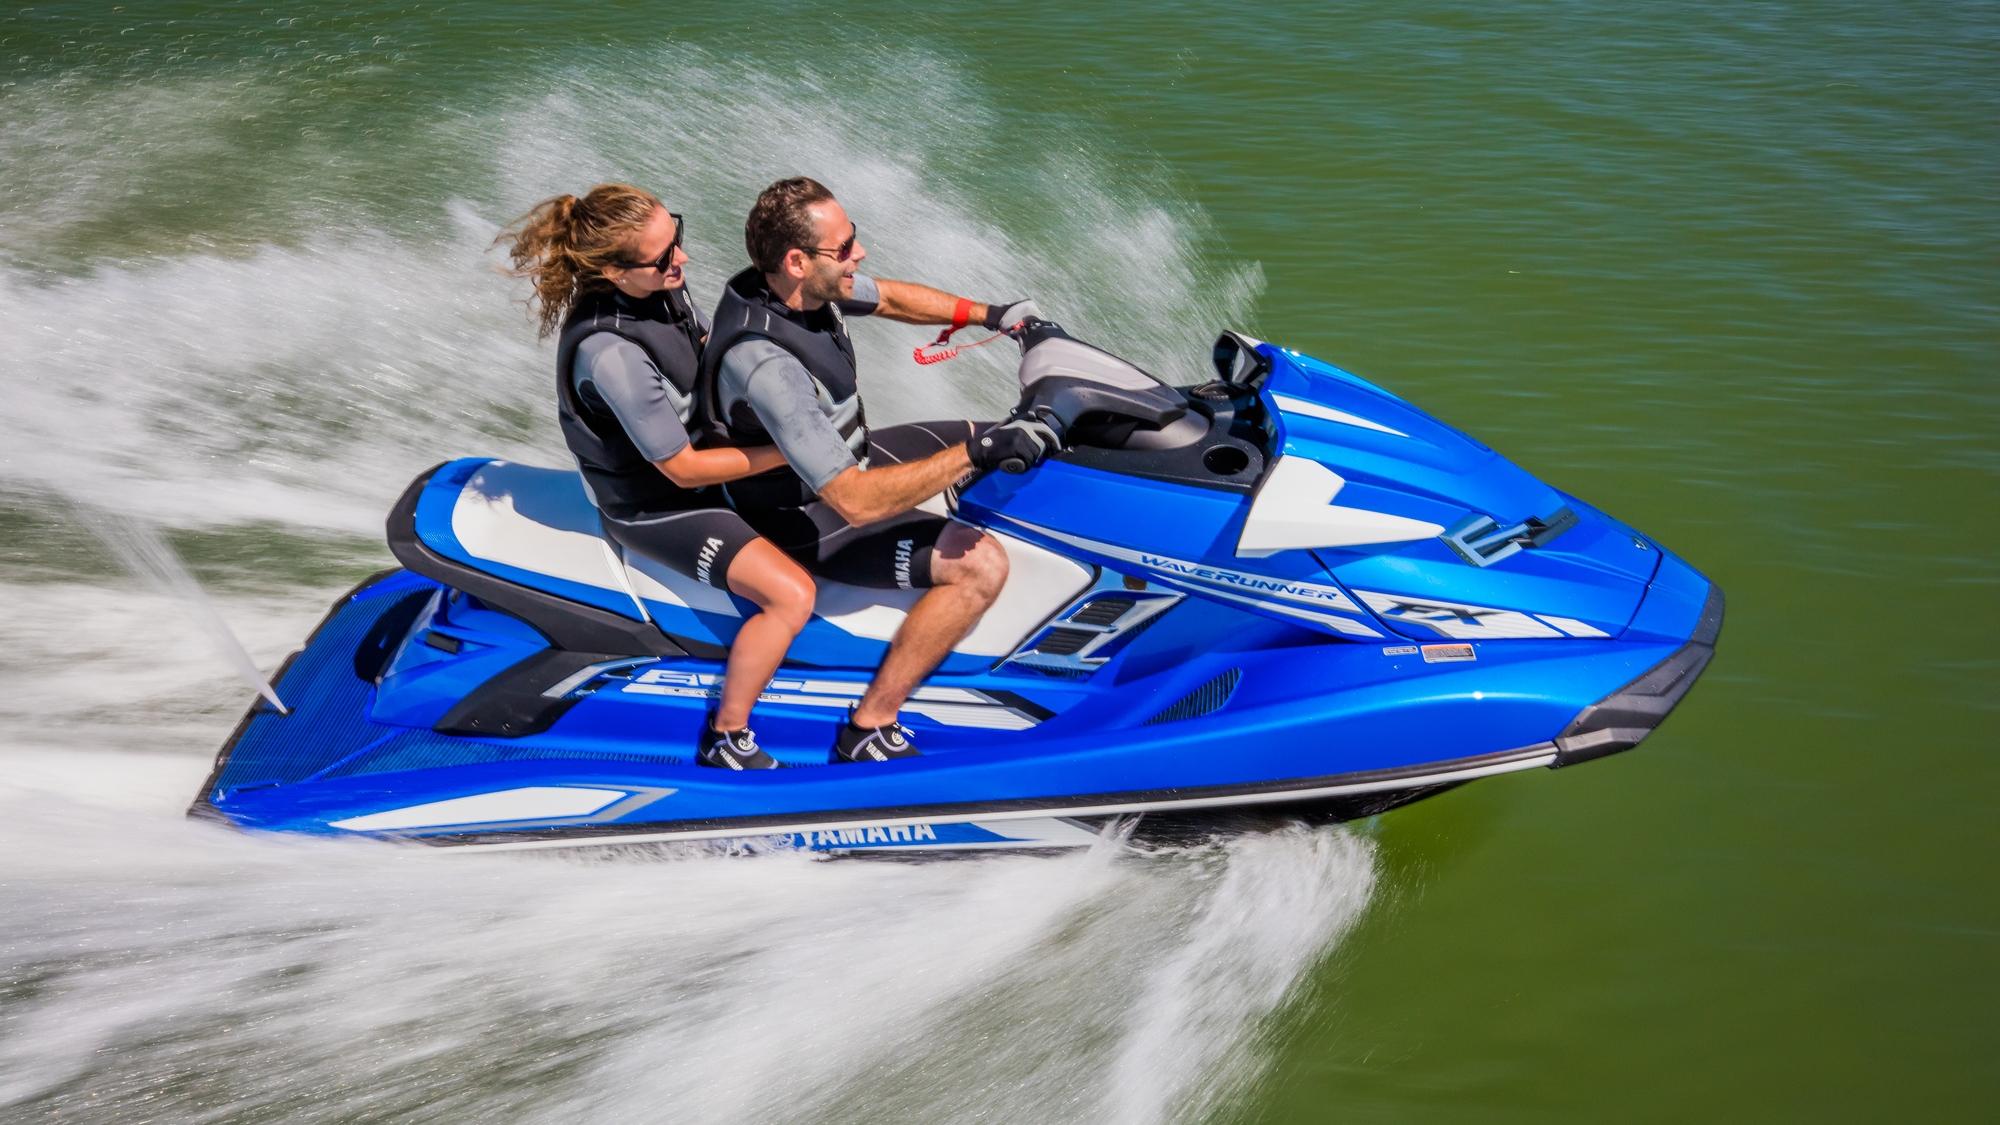 2017-Yamaha-FX-SHO-EU-Azure-Blue-Metallic-Action-001